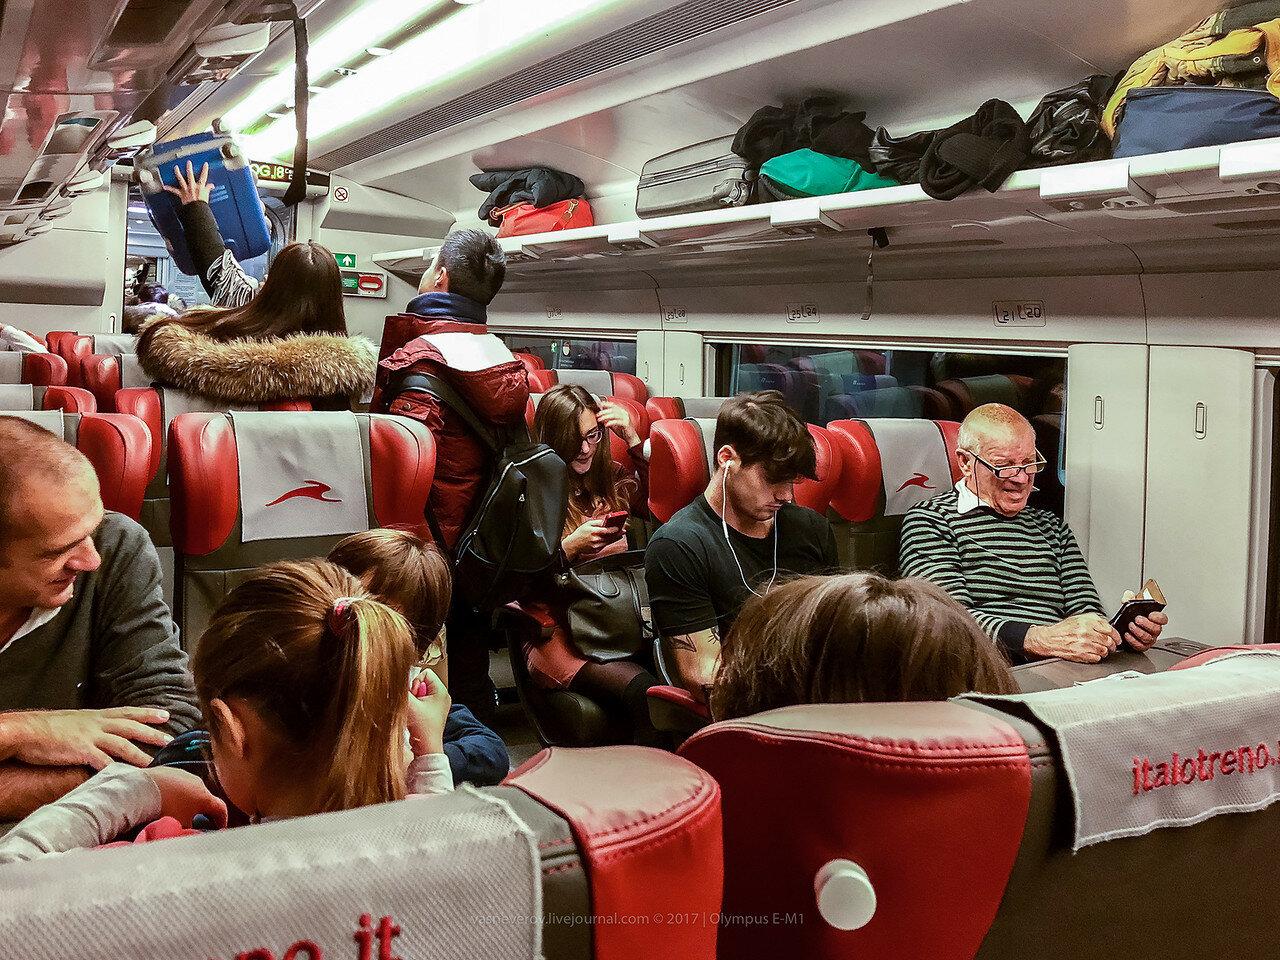 milano treno train vasneverov вася за границей